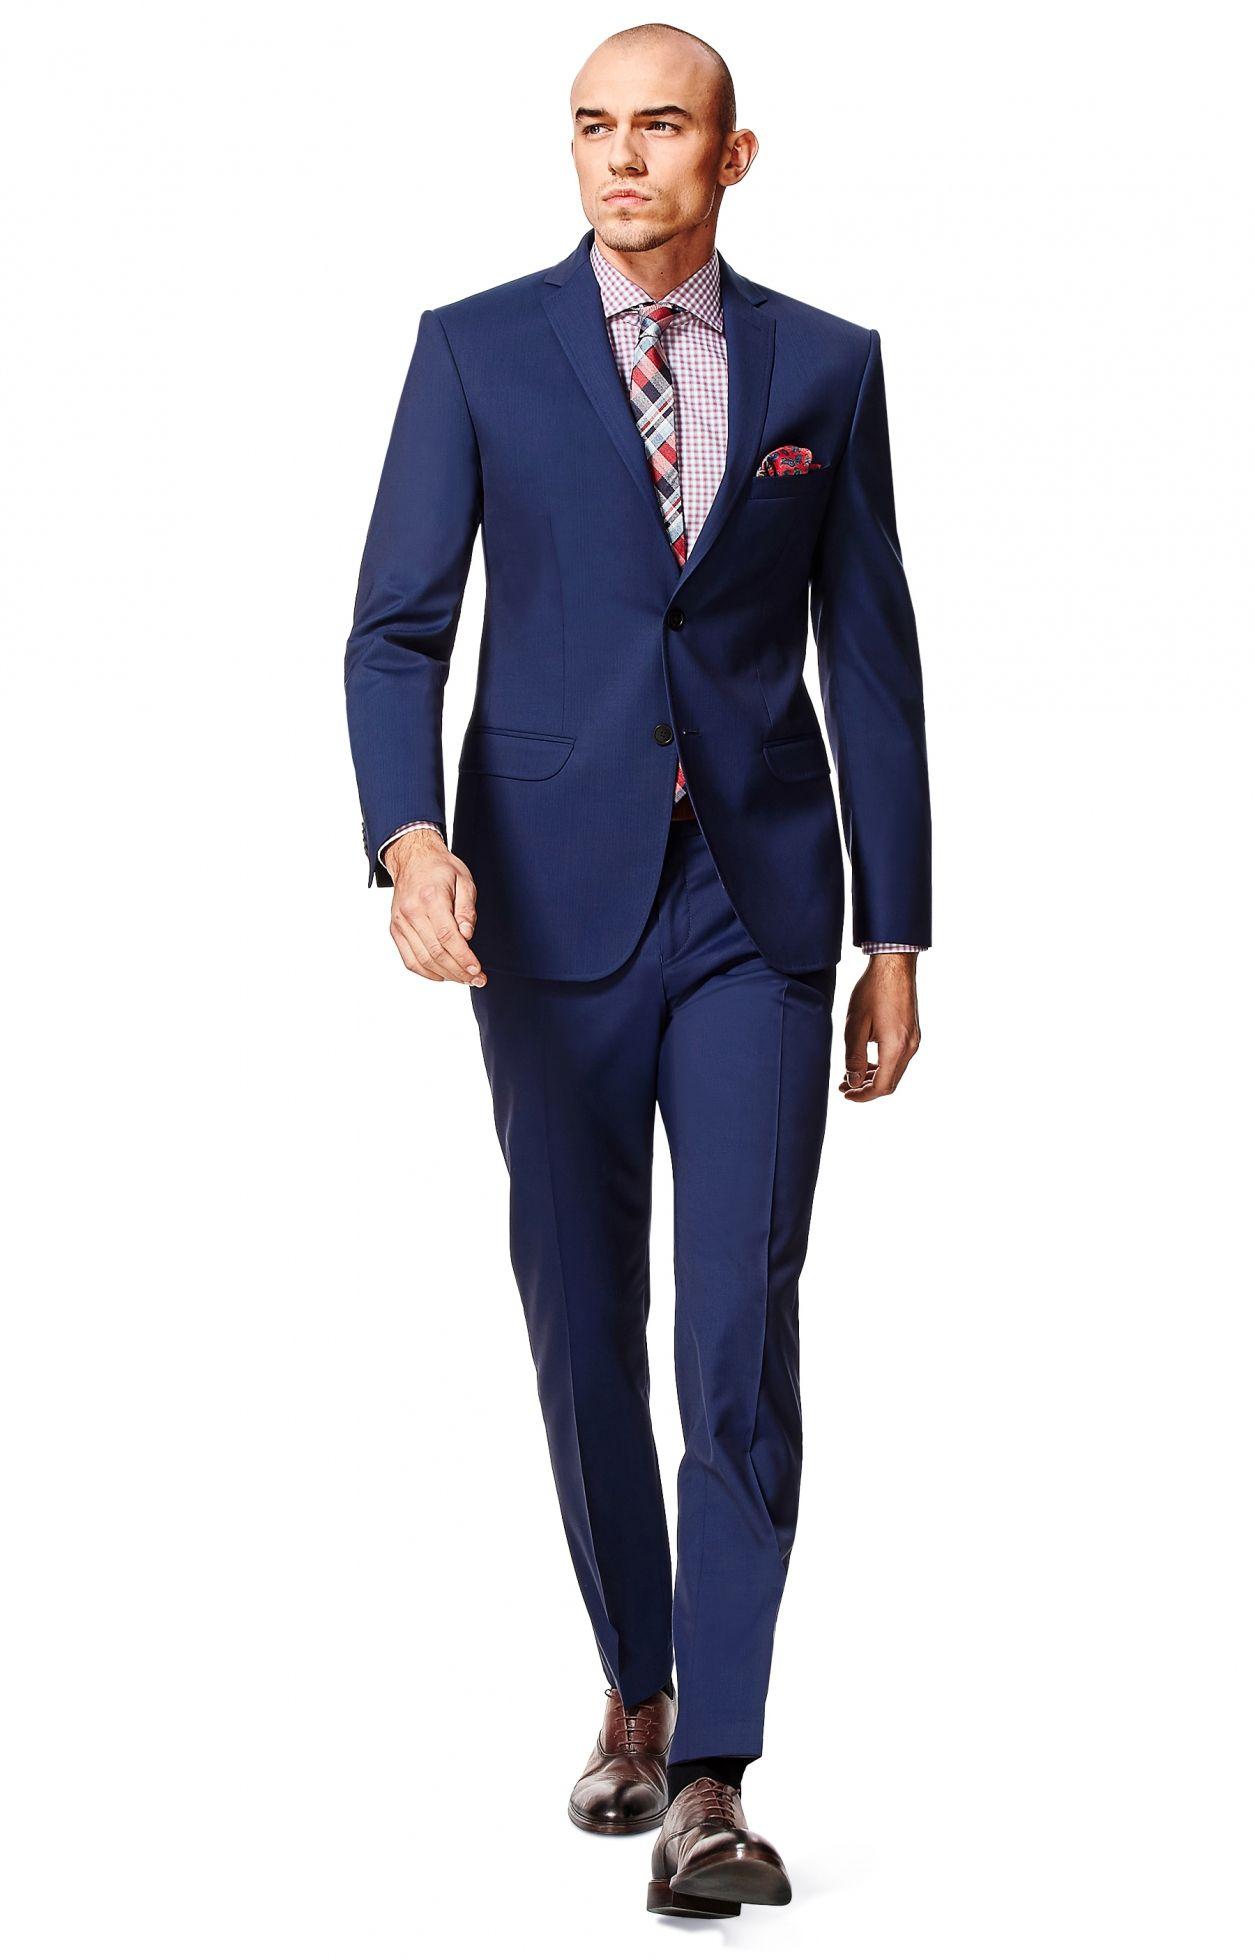 Garnitur Bronx 649 99 Zl 72824 Sklep Vistula Pl Fashion Suit Jacket Suits